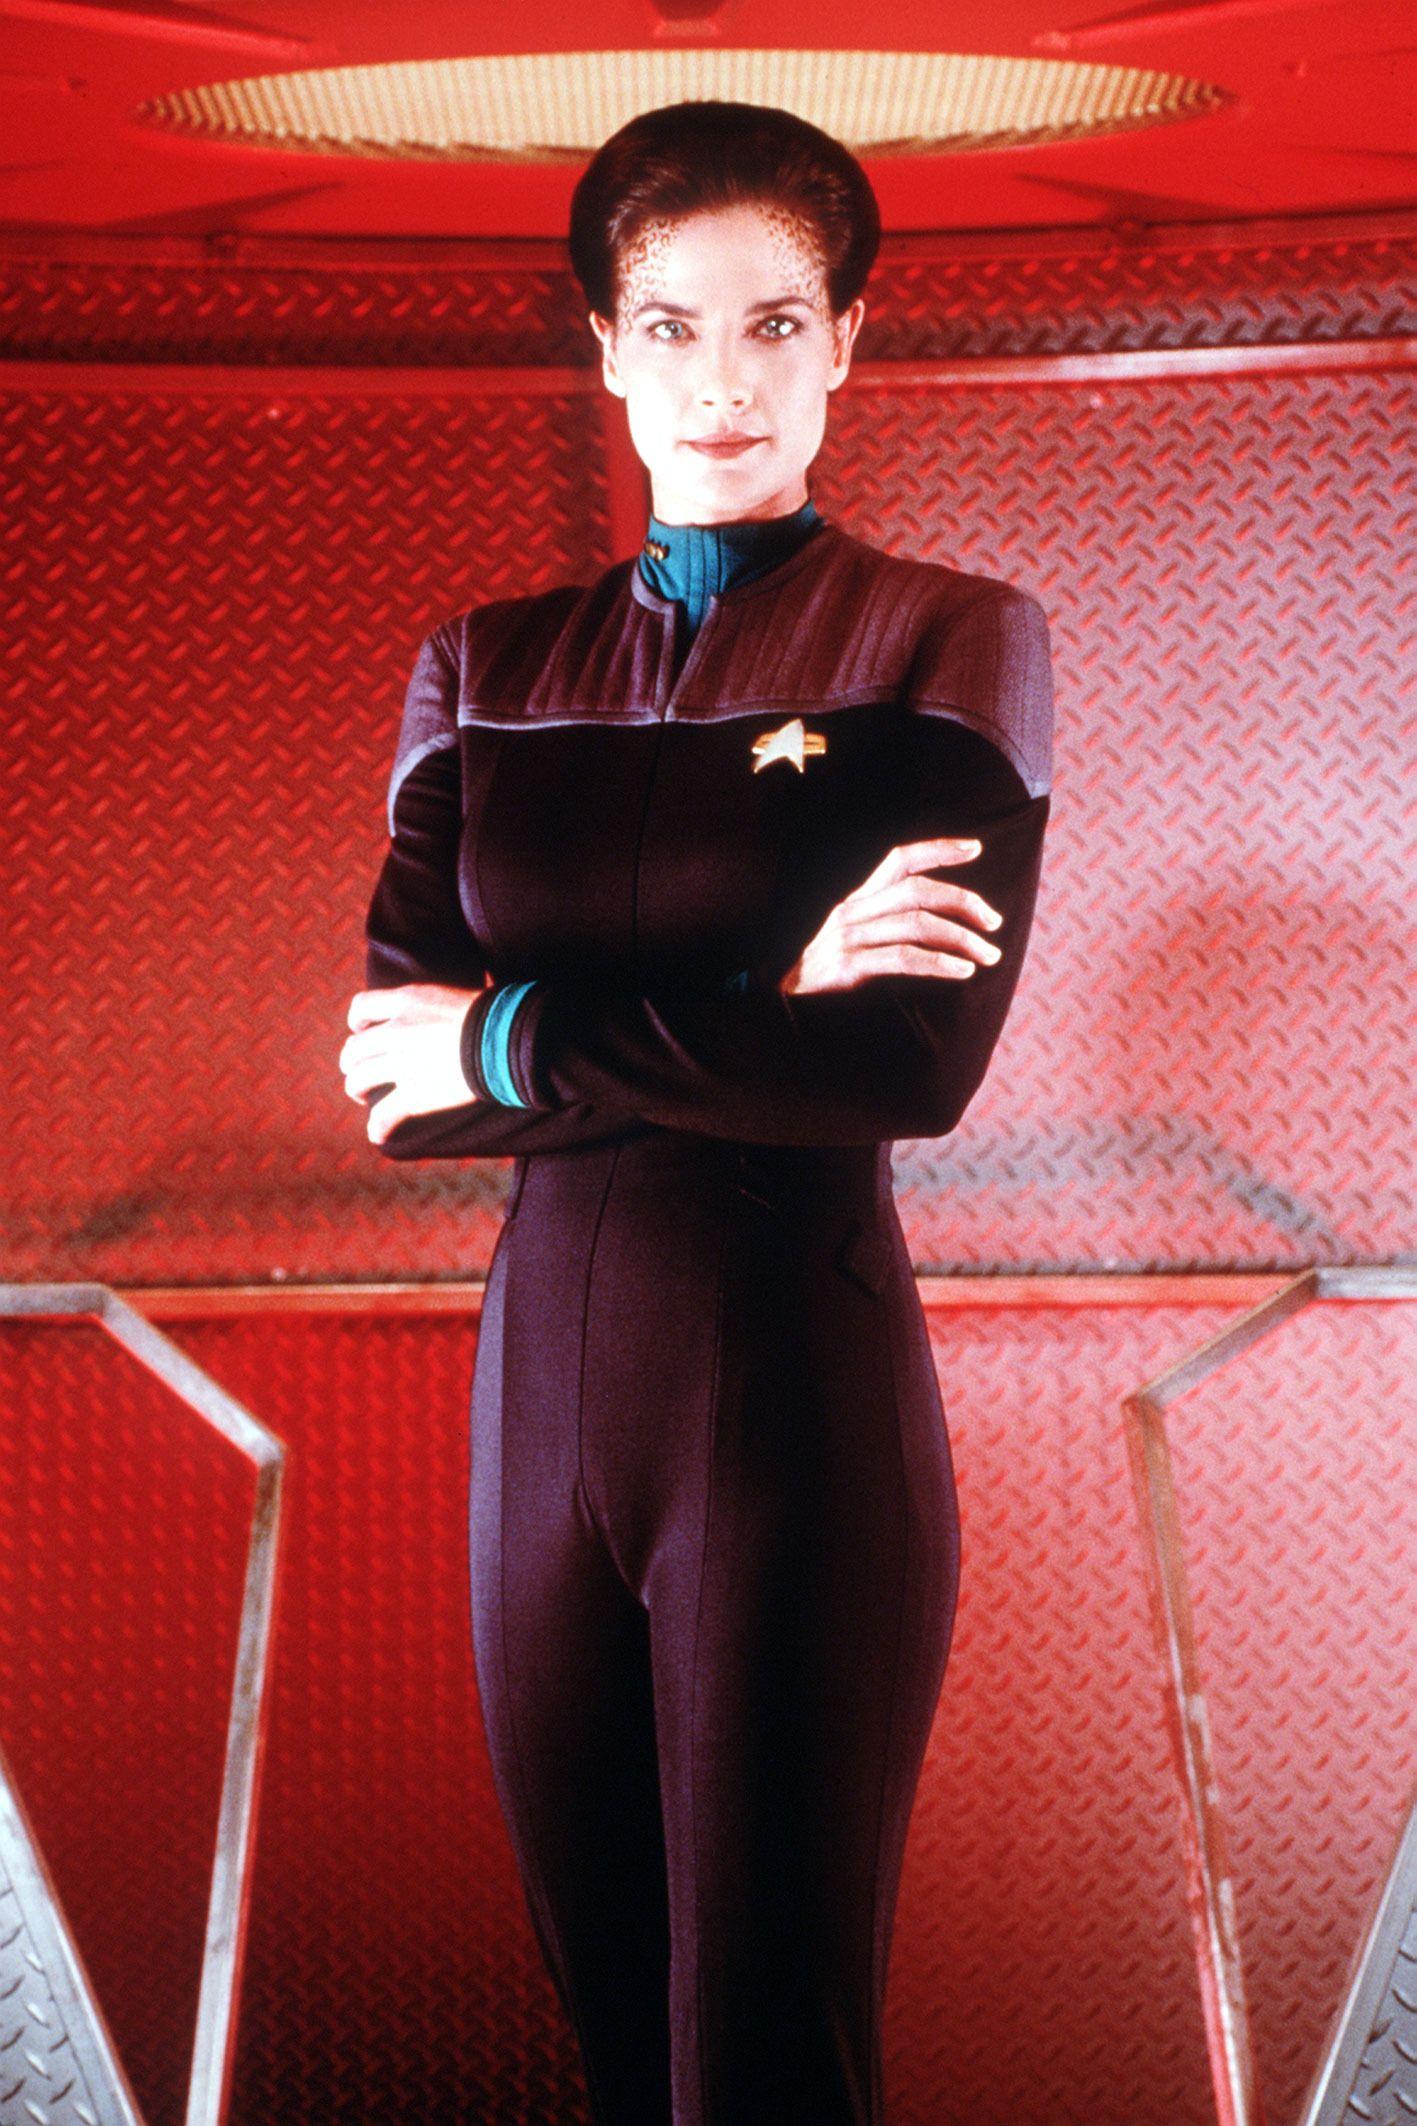 Jadzia Dax Star Trek Scotty Star Trek Star Trek Funny